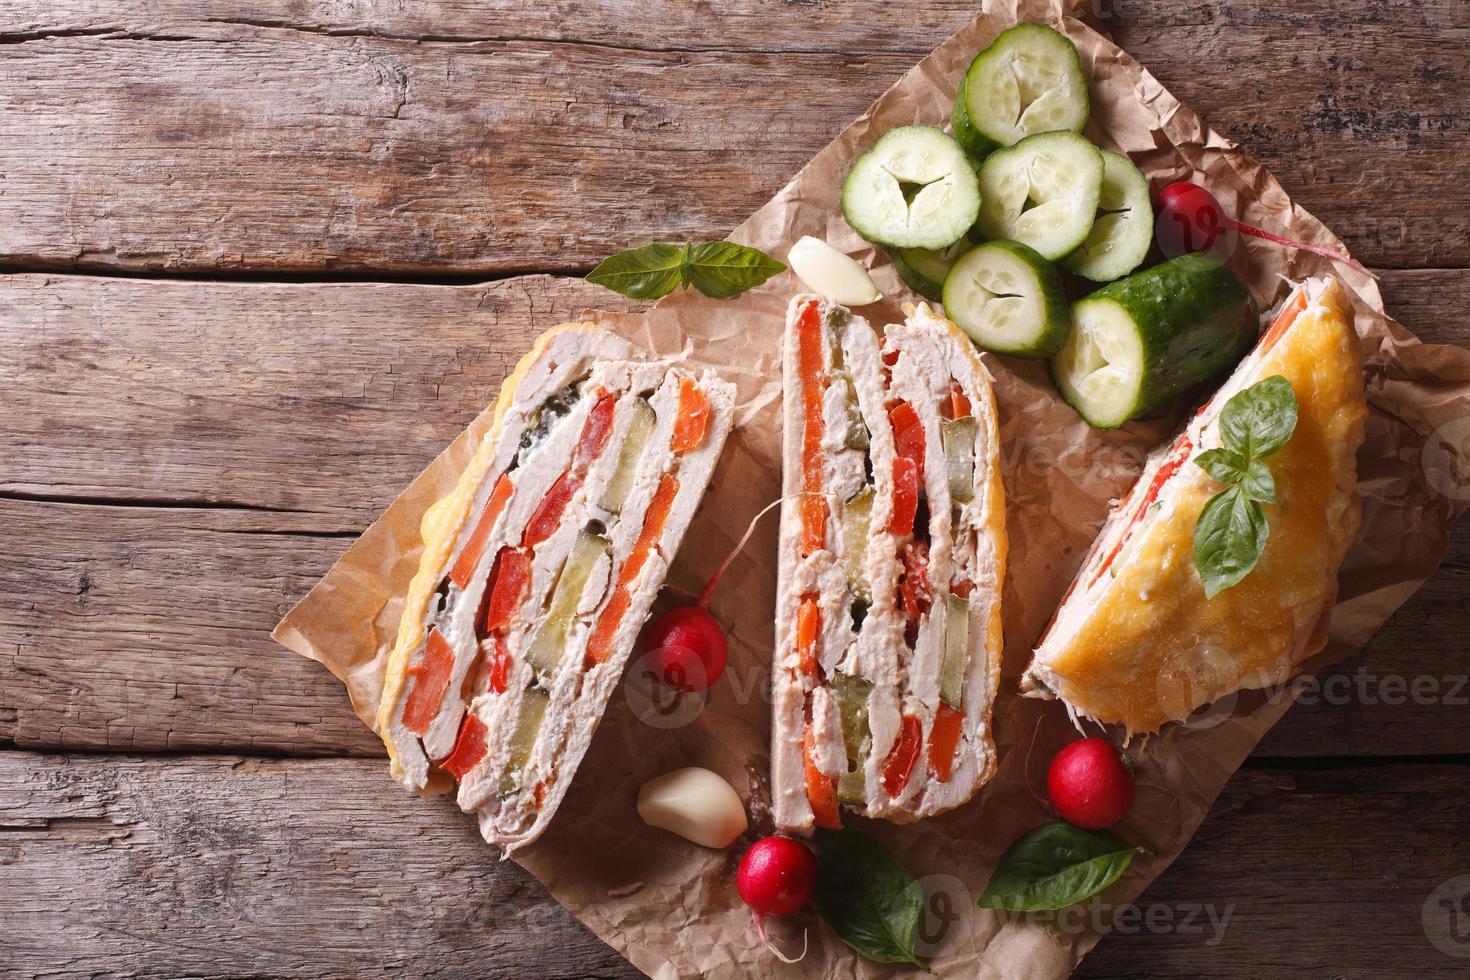 pedaços de torta de frango e legumes vista superior horizontal foto